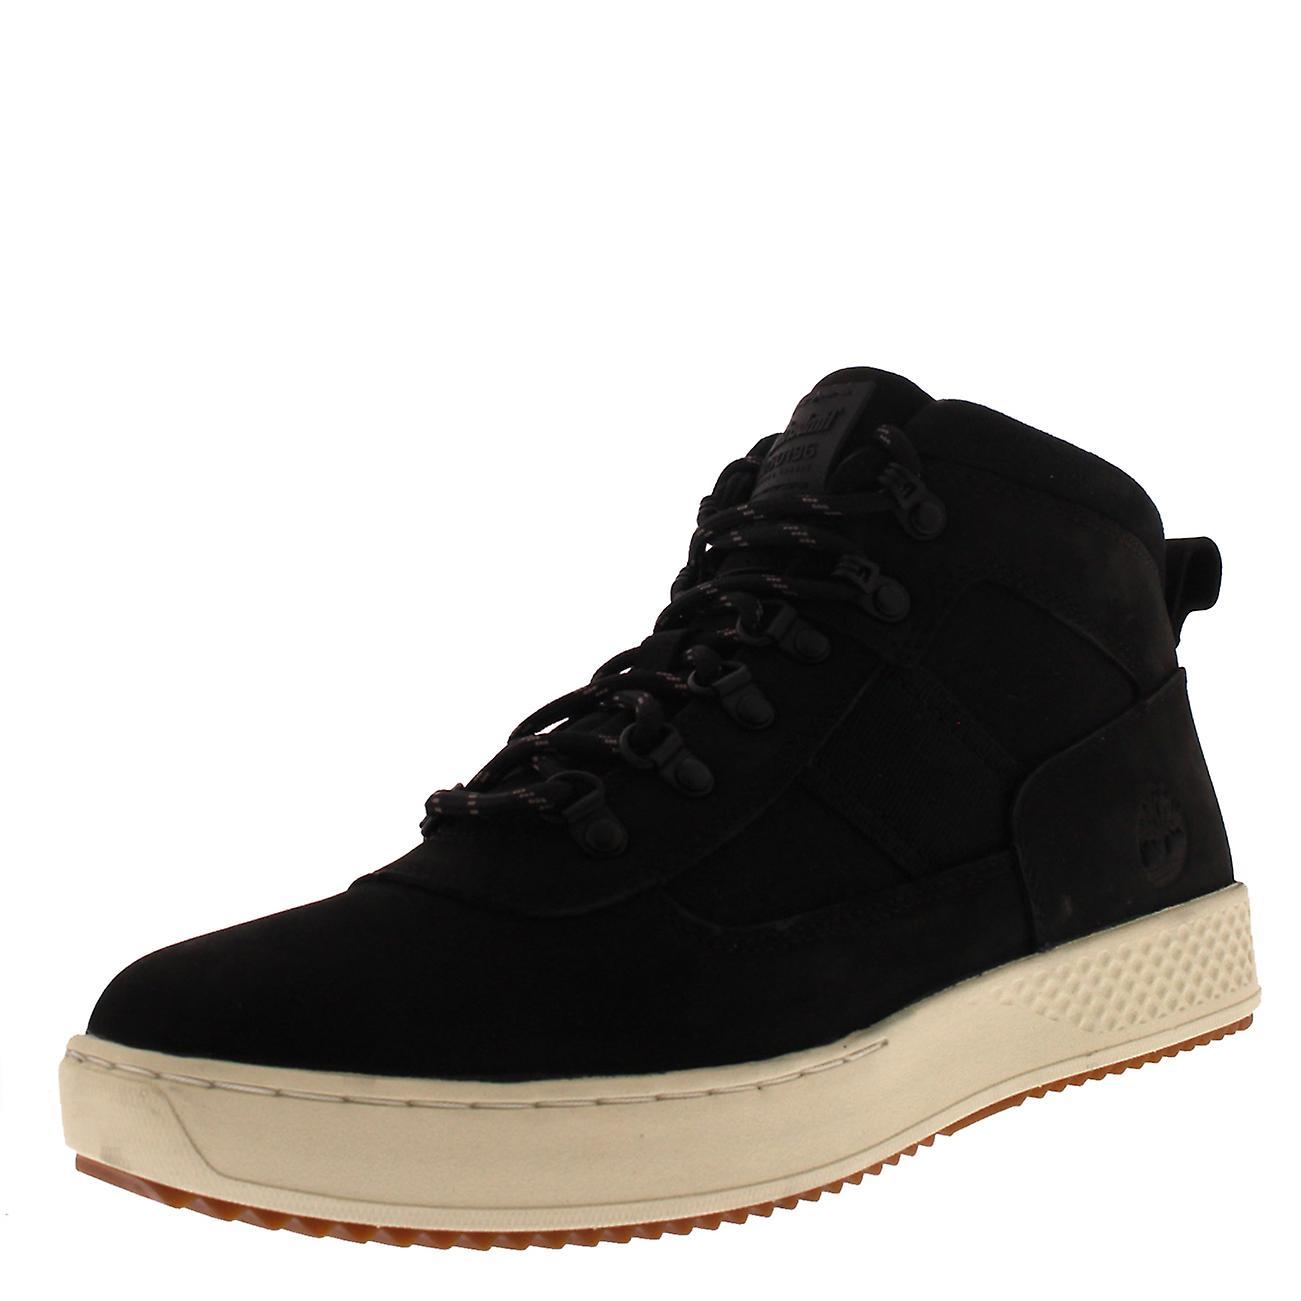 Timberland City Roam Cupsole Boots Black, Men's Fashion